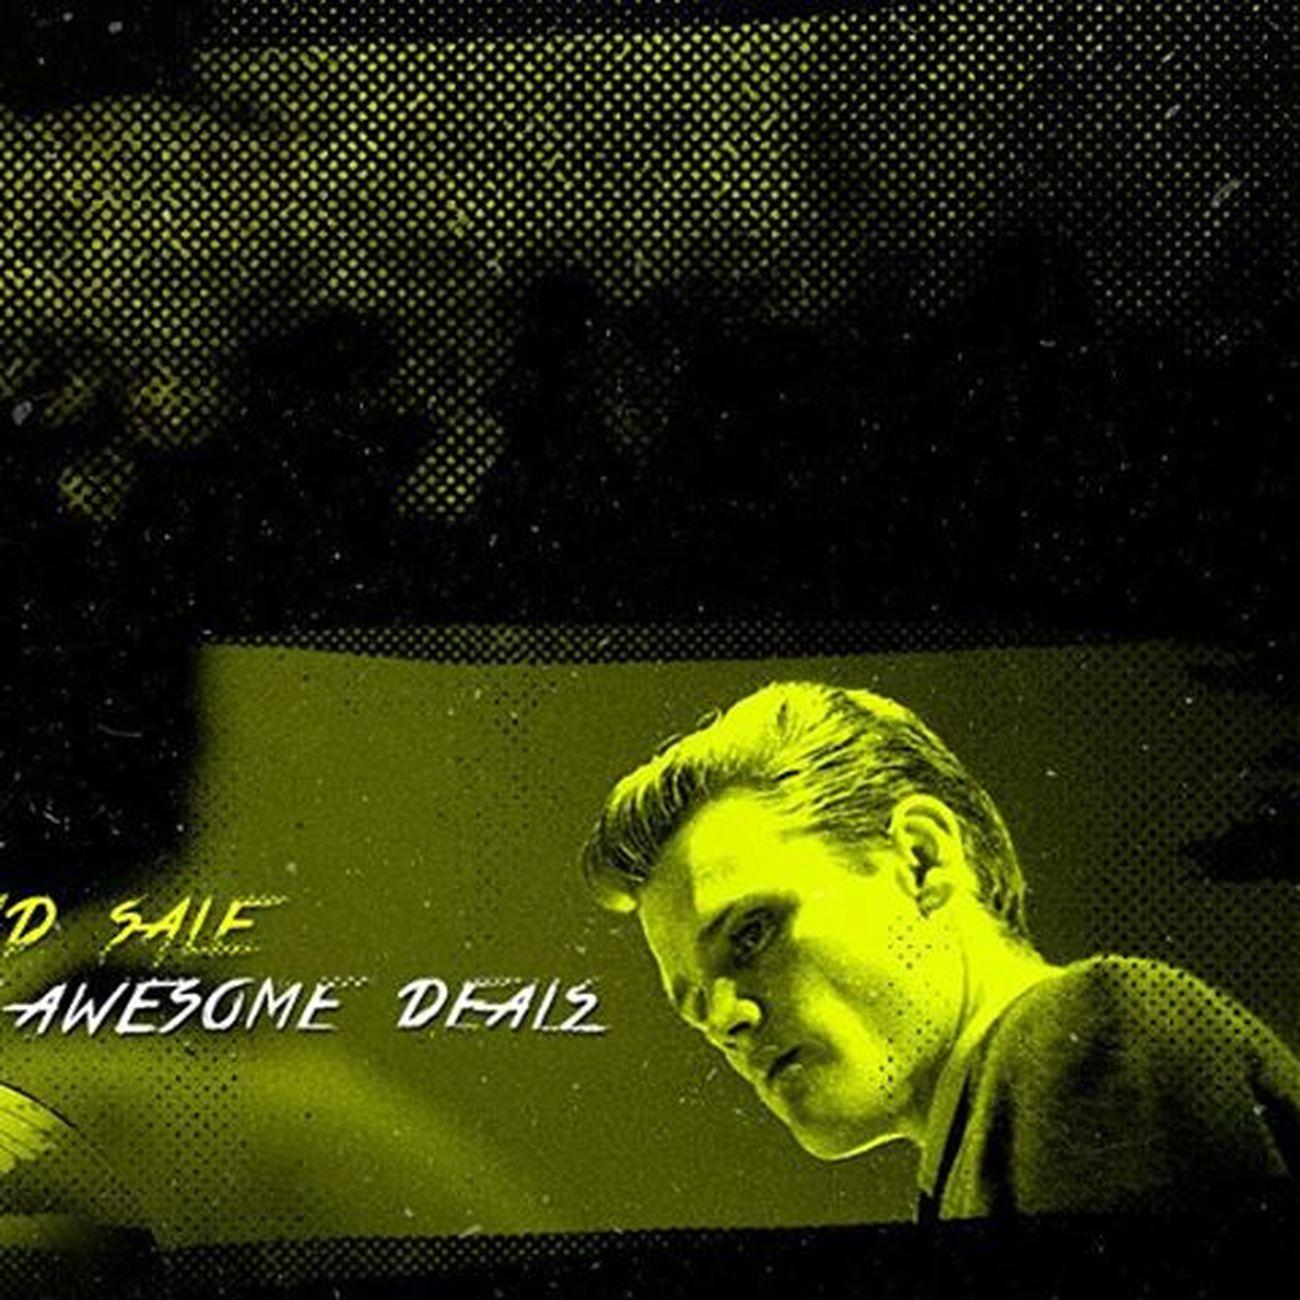 ". Next Week!!! Santa Music Club ""SALE OUT 2015"" Year End Sale !!! December 26th at Santa Modern Market, South Jakarta. Over 50 Label/Distribution/Personal Booth, with Guest Dj & Band Lots of Awesome Deals Piringanhitam Vinyl Santasaleout2015 Saleout Yearendsale Recordstore Jajanjazz Jajanrock Music Vinyligclub Instagram"